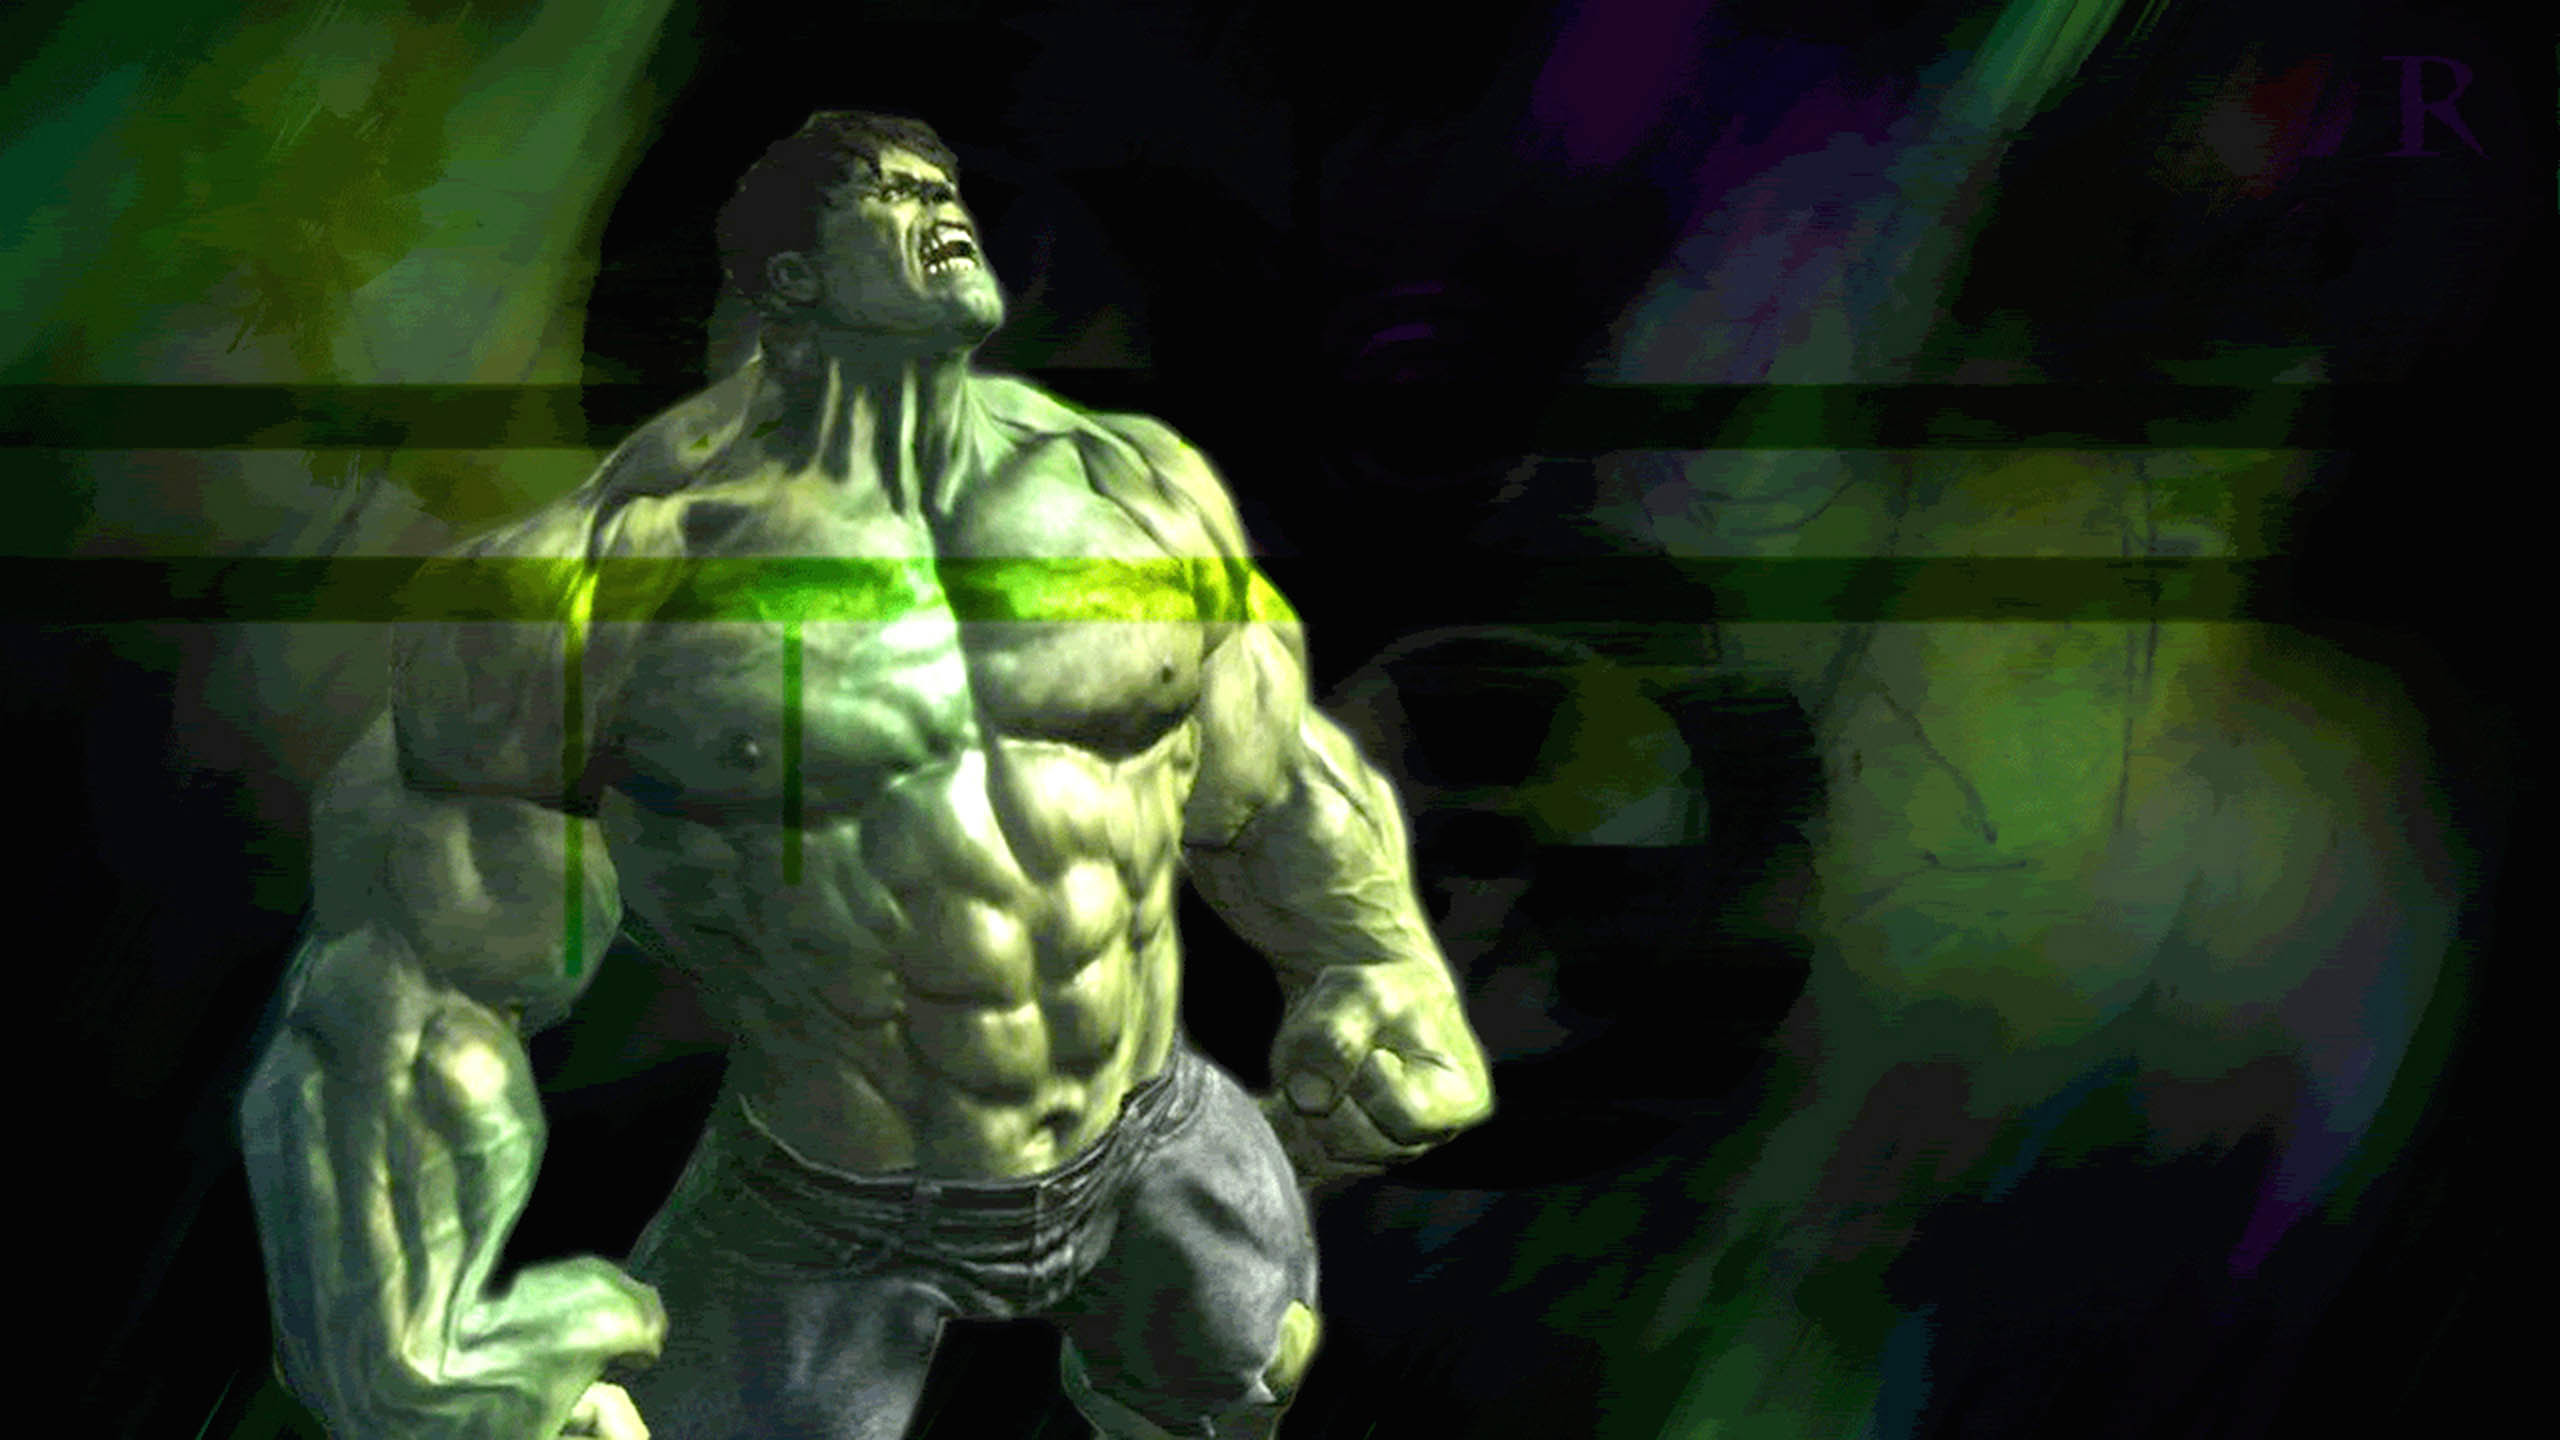 Incredible hulk wallpaper 2018 58 images - Hulk hd images free download ...